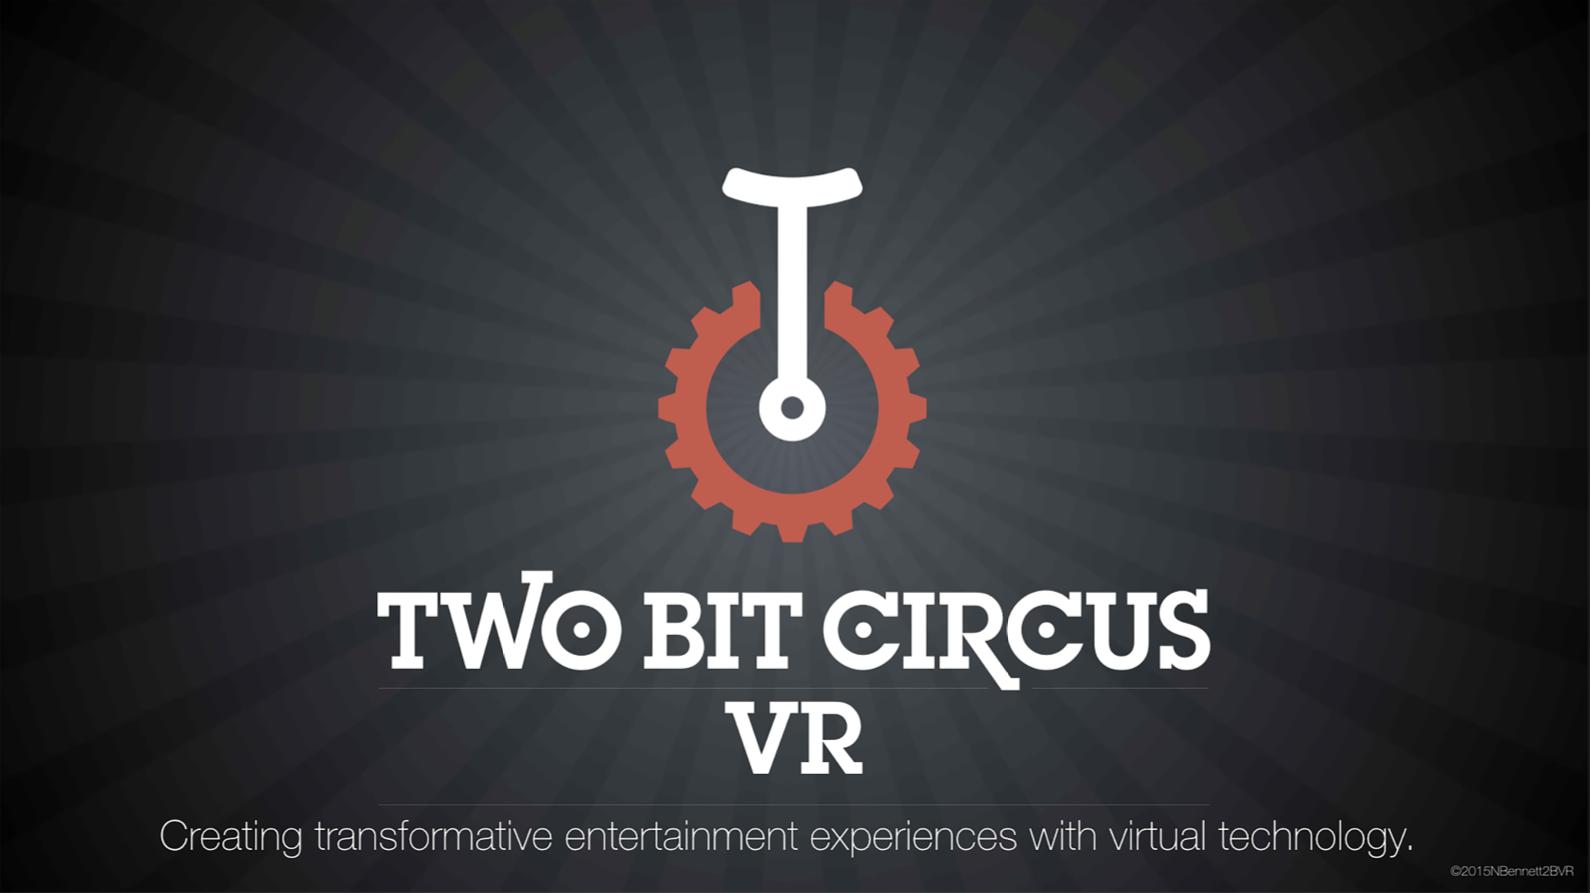 Two-Bit-Circus-VR-logo.png